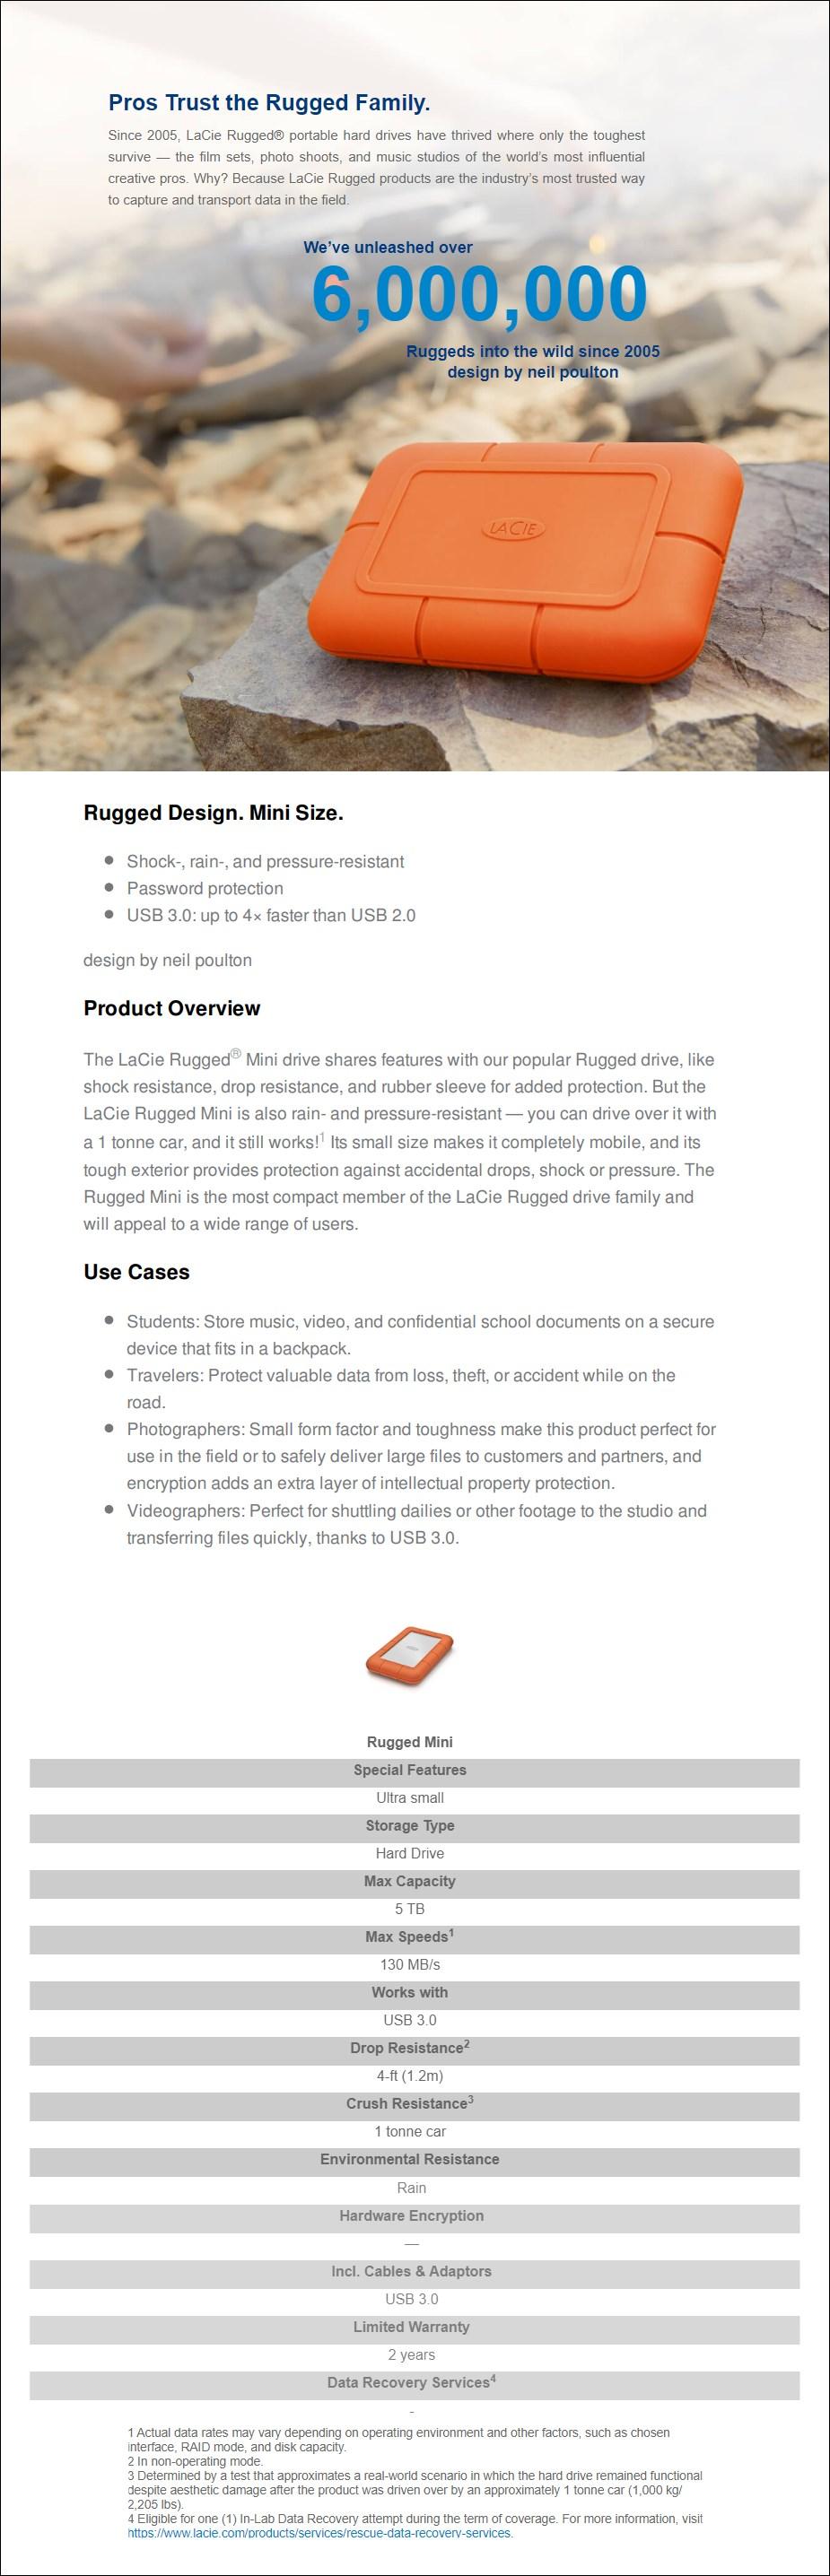 lacie-5tb-usbafa-30-rugged-mini-portable-hard-drive-ac28750-6.jpg